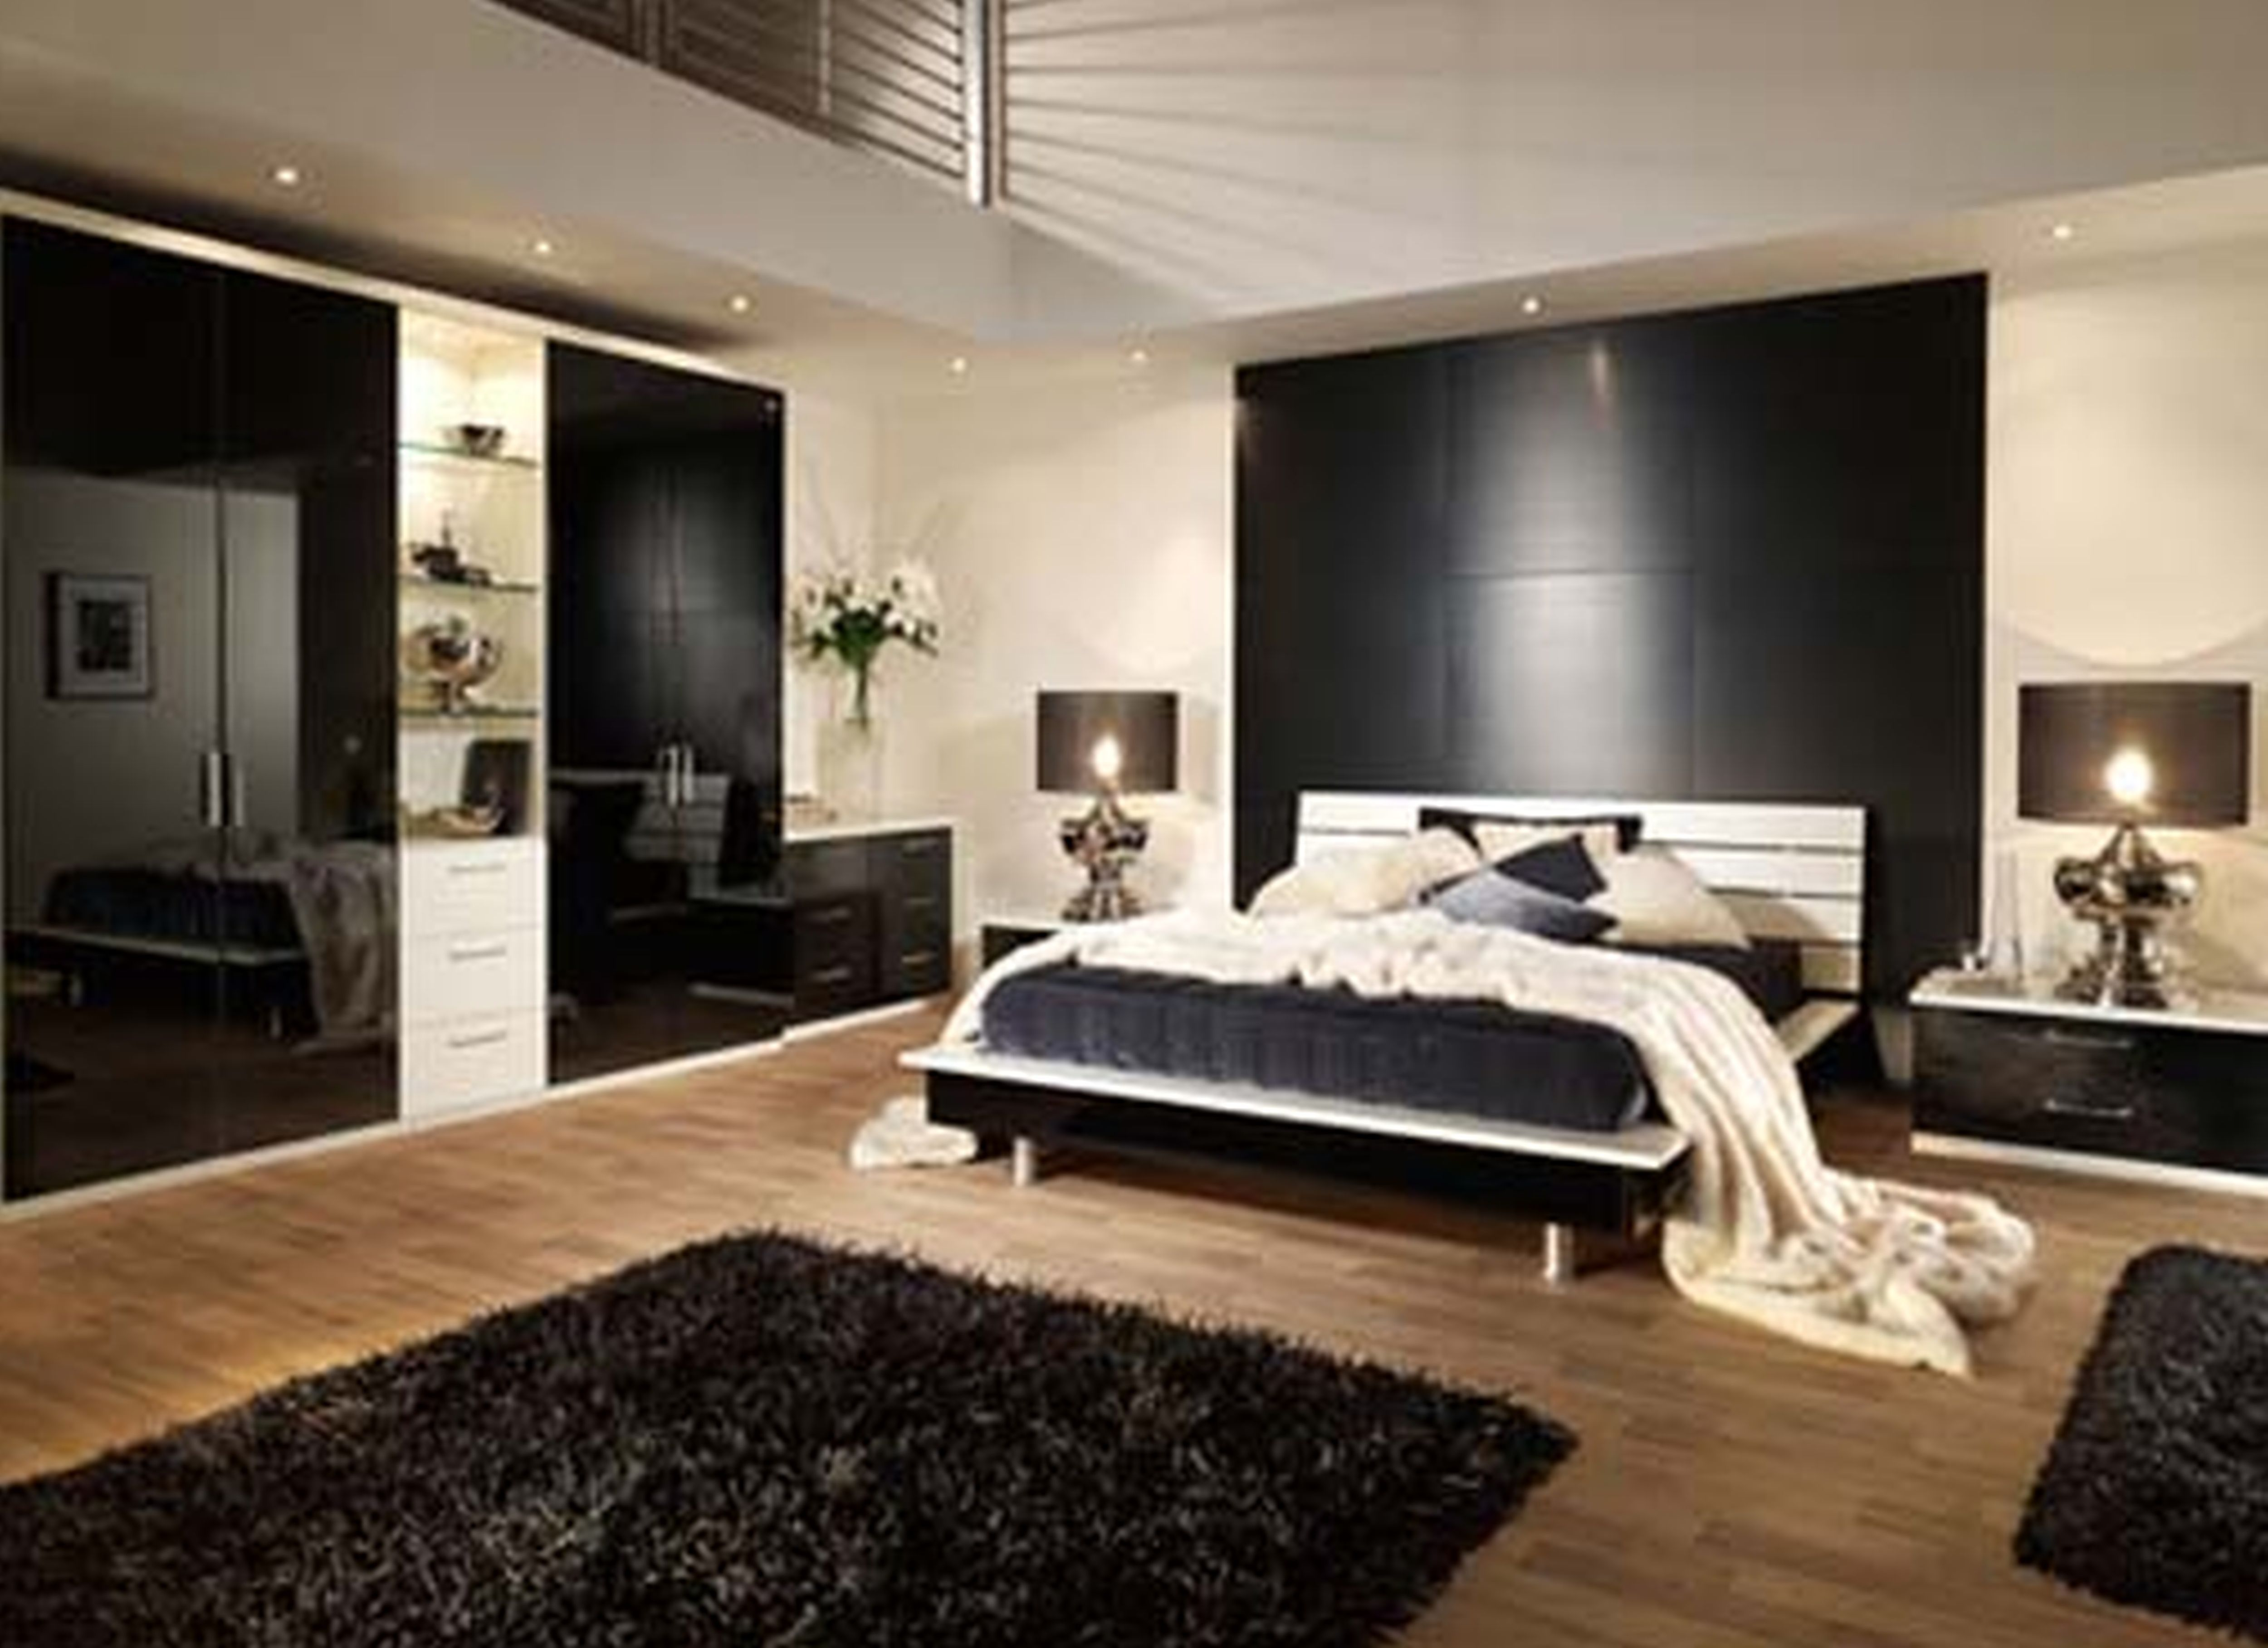 Inspiring bedroom design ideas for men decorate a bedroom for Minimalist bedroom pinterest